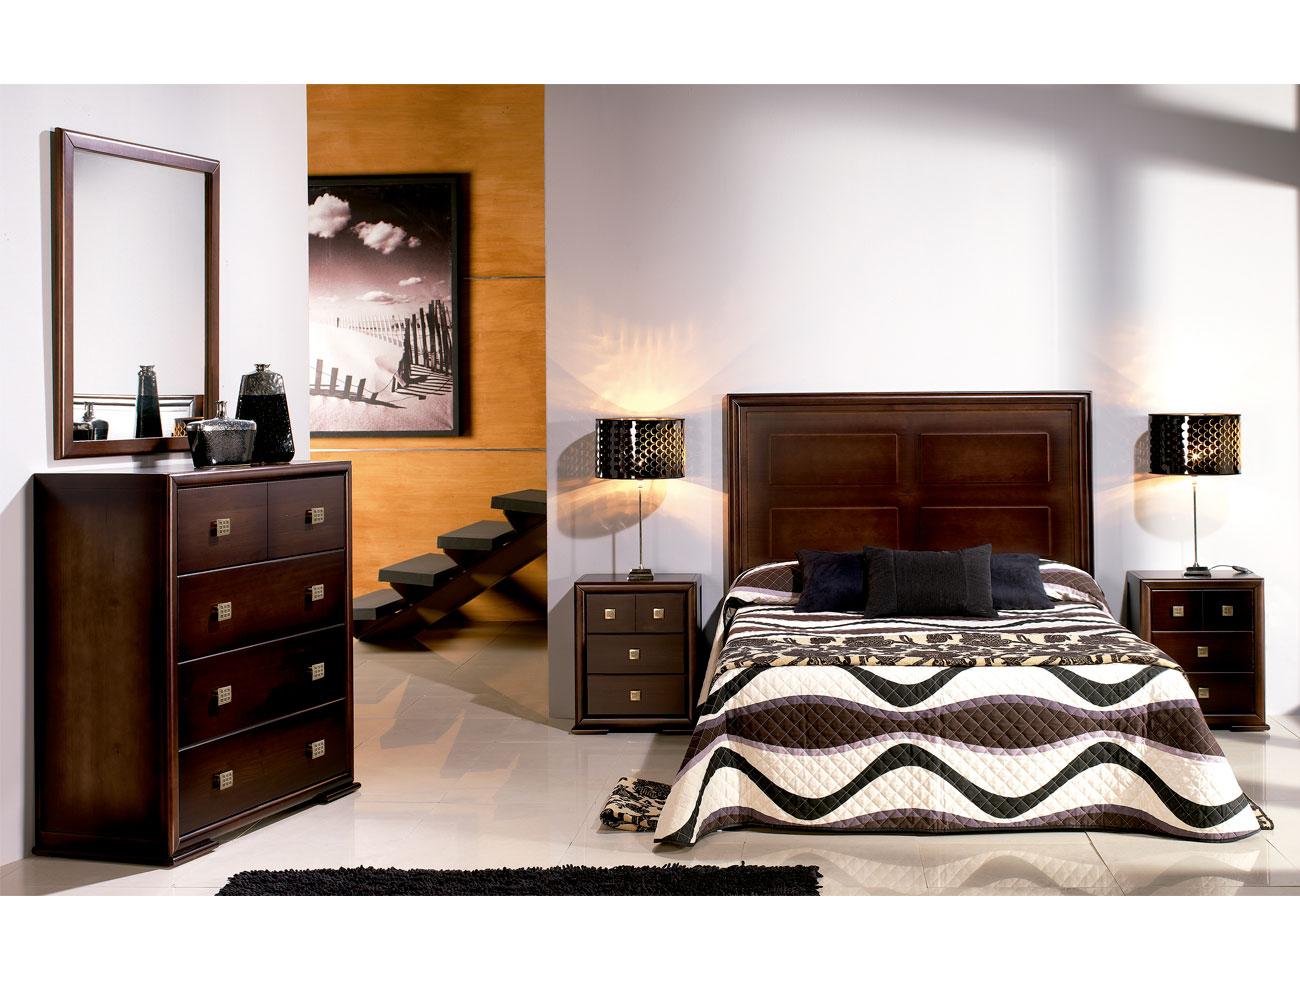 Composicion01 dormitorio matrimonio comoda madera3